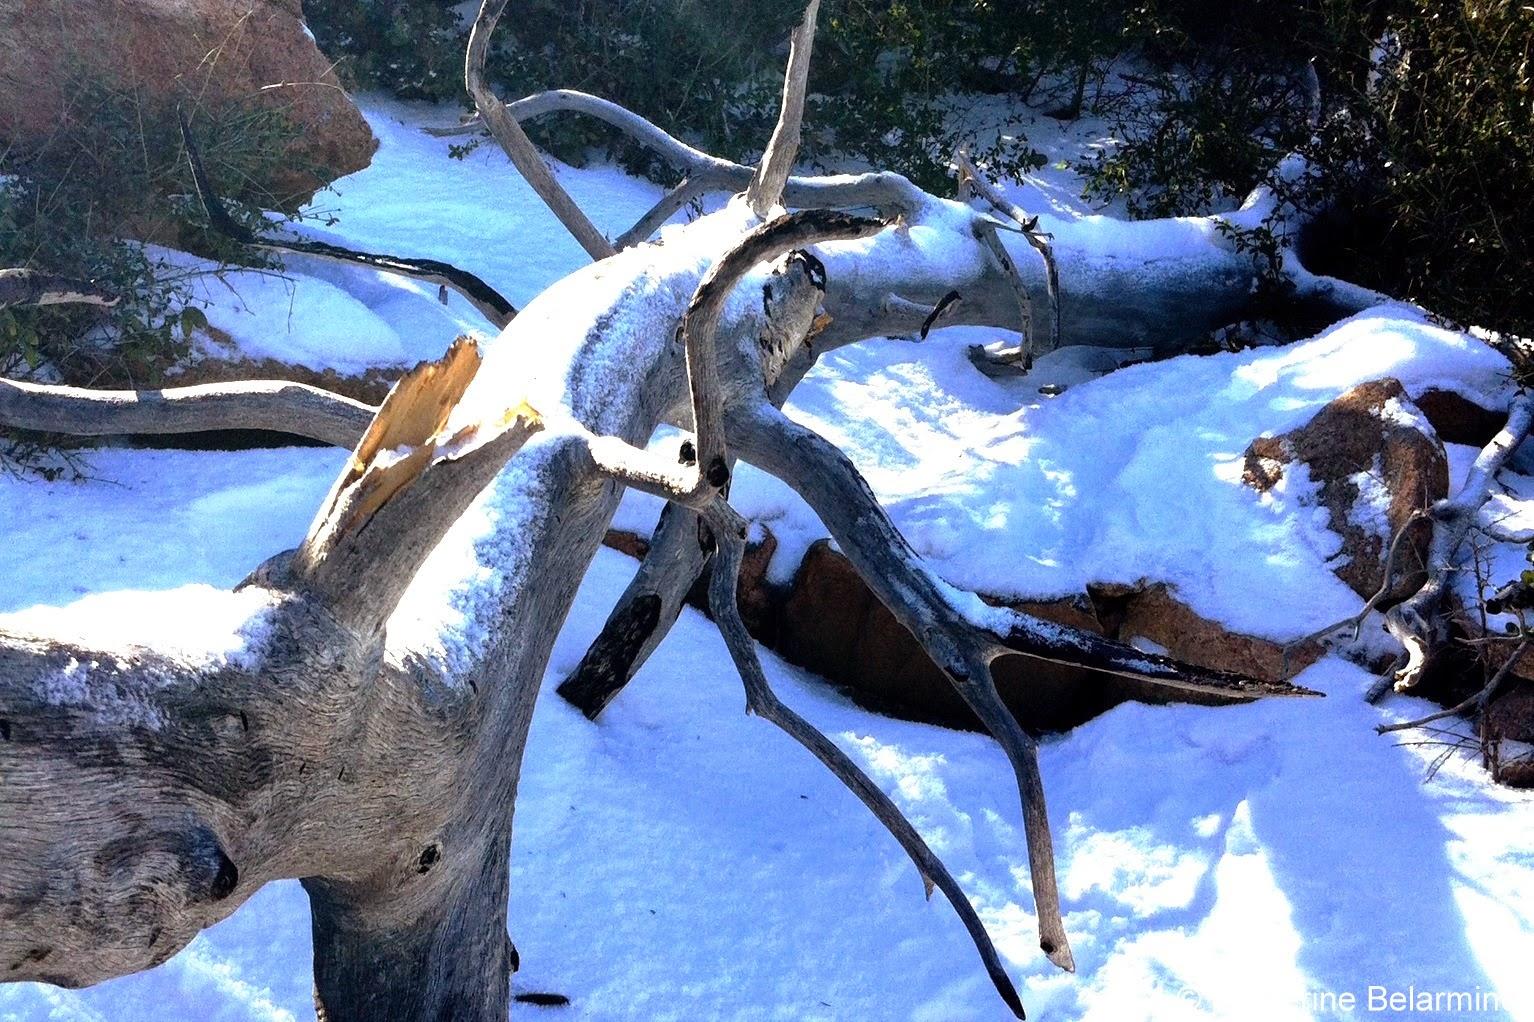 Snow on a Fallen Tree on San Diego's Stonewall Peak Hiking Trail